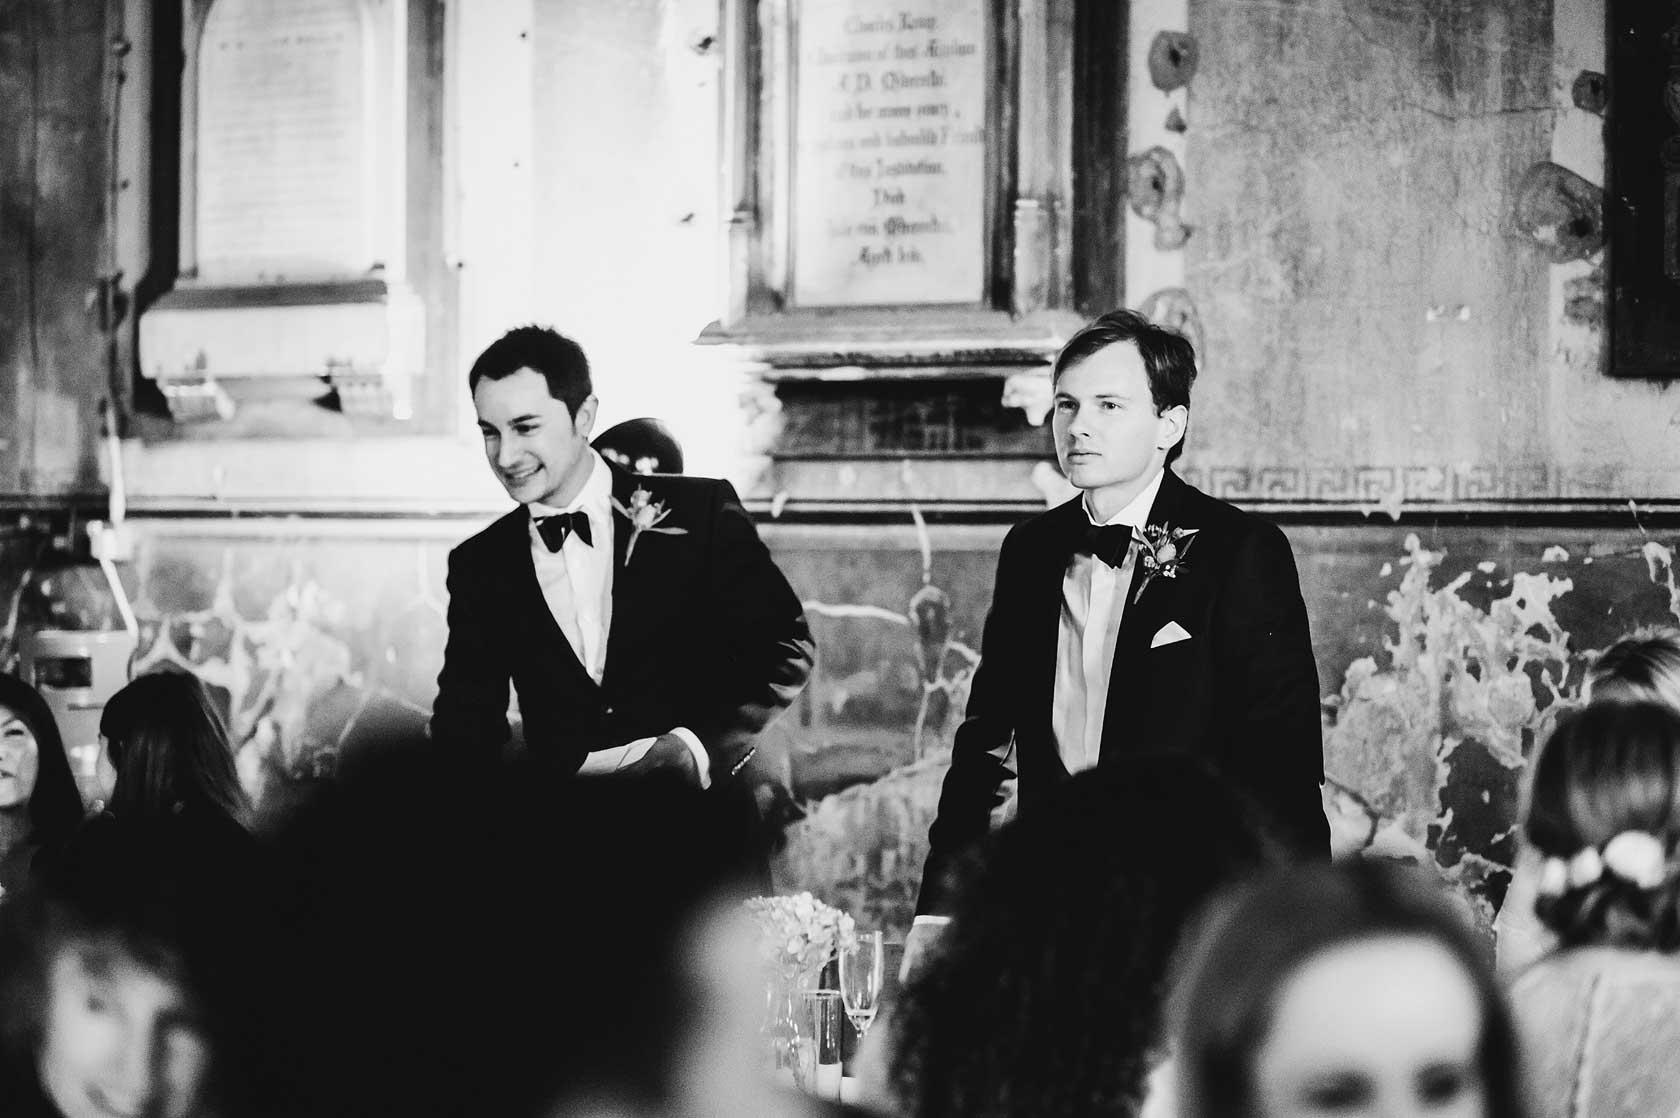 London Winter Wedding Photographer